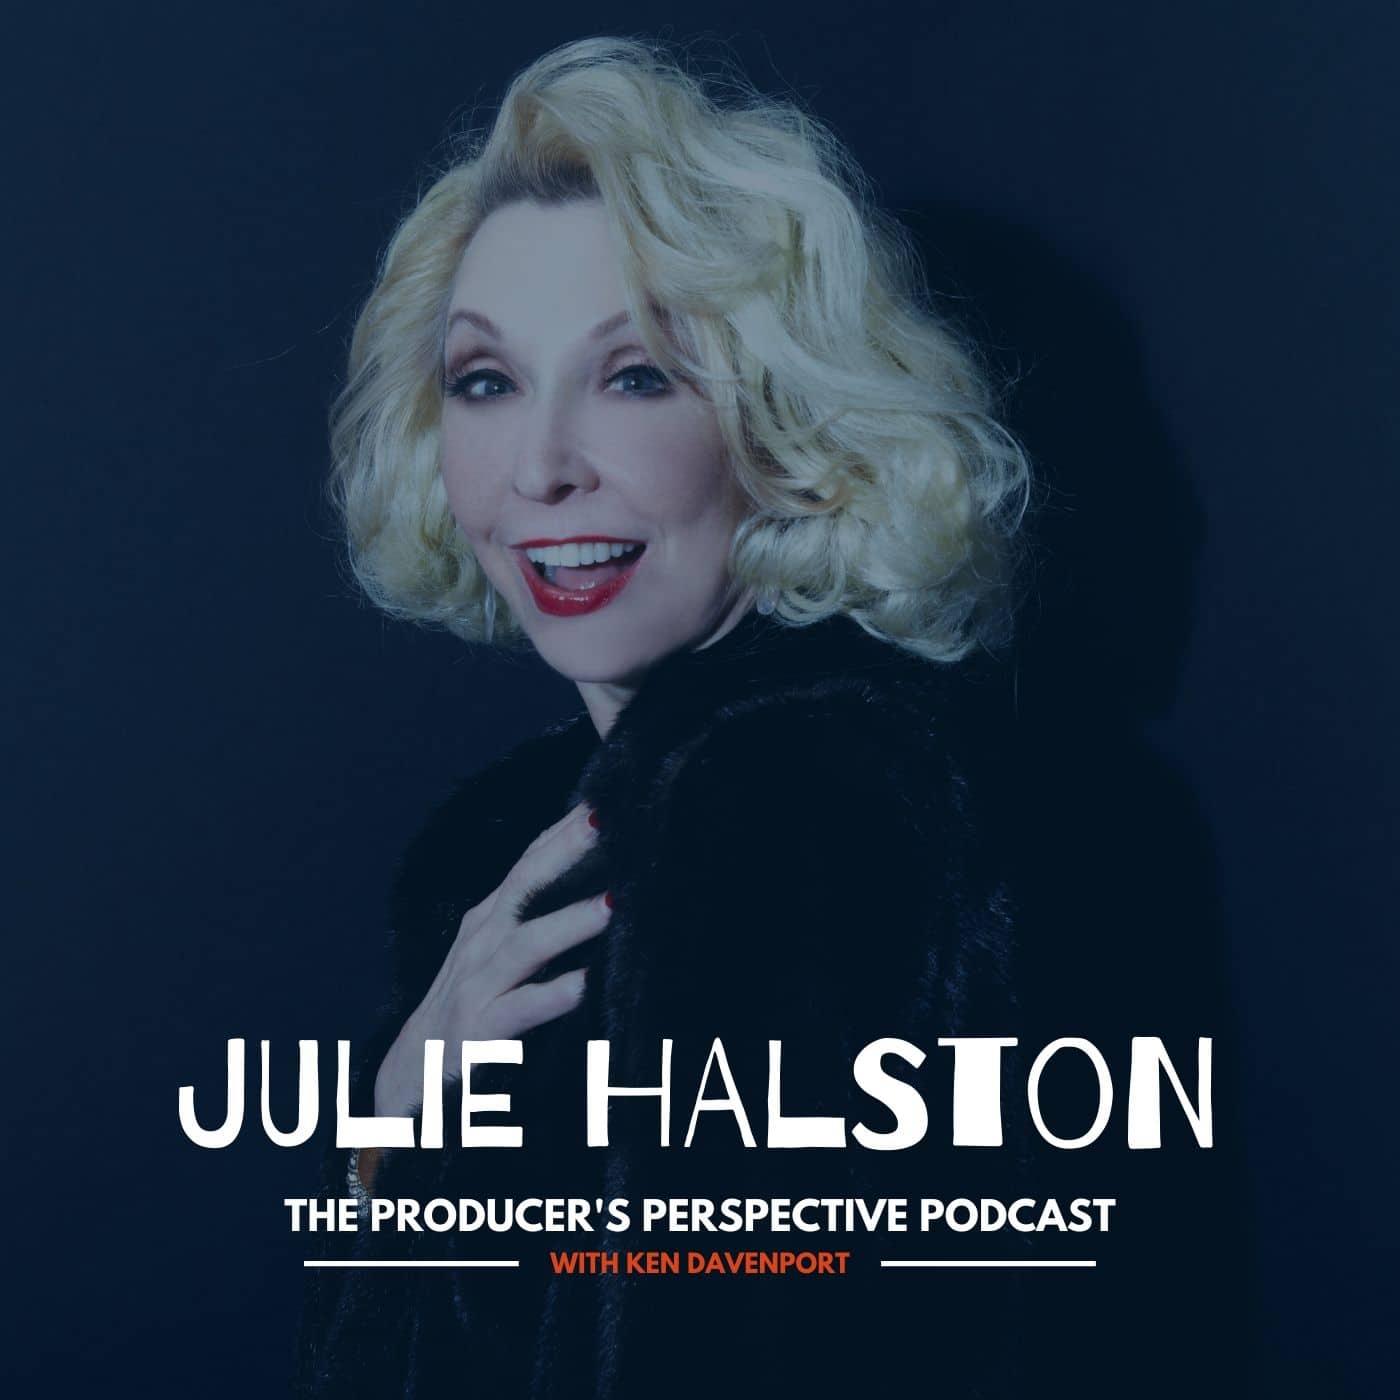 Ken Davenport's The Producer's Perspective Podcast Episode 193 - Julie Halston